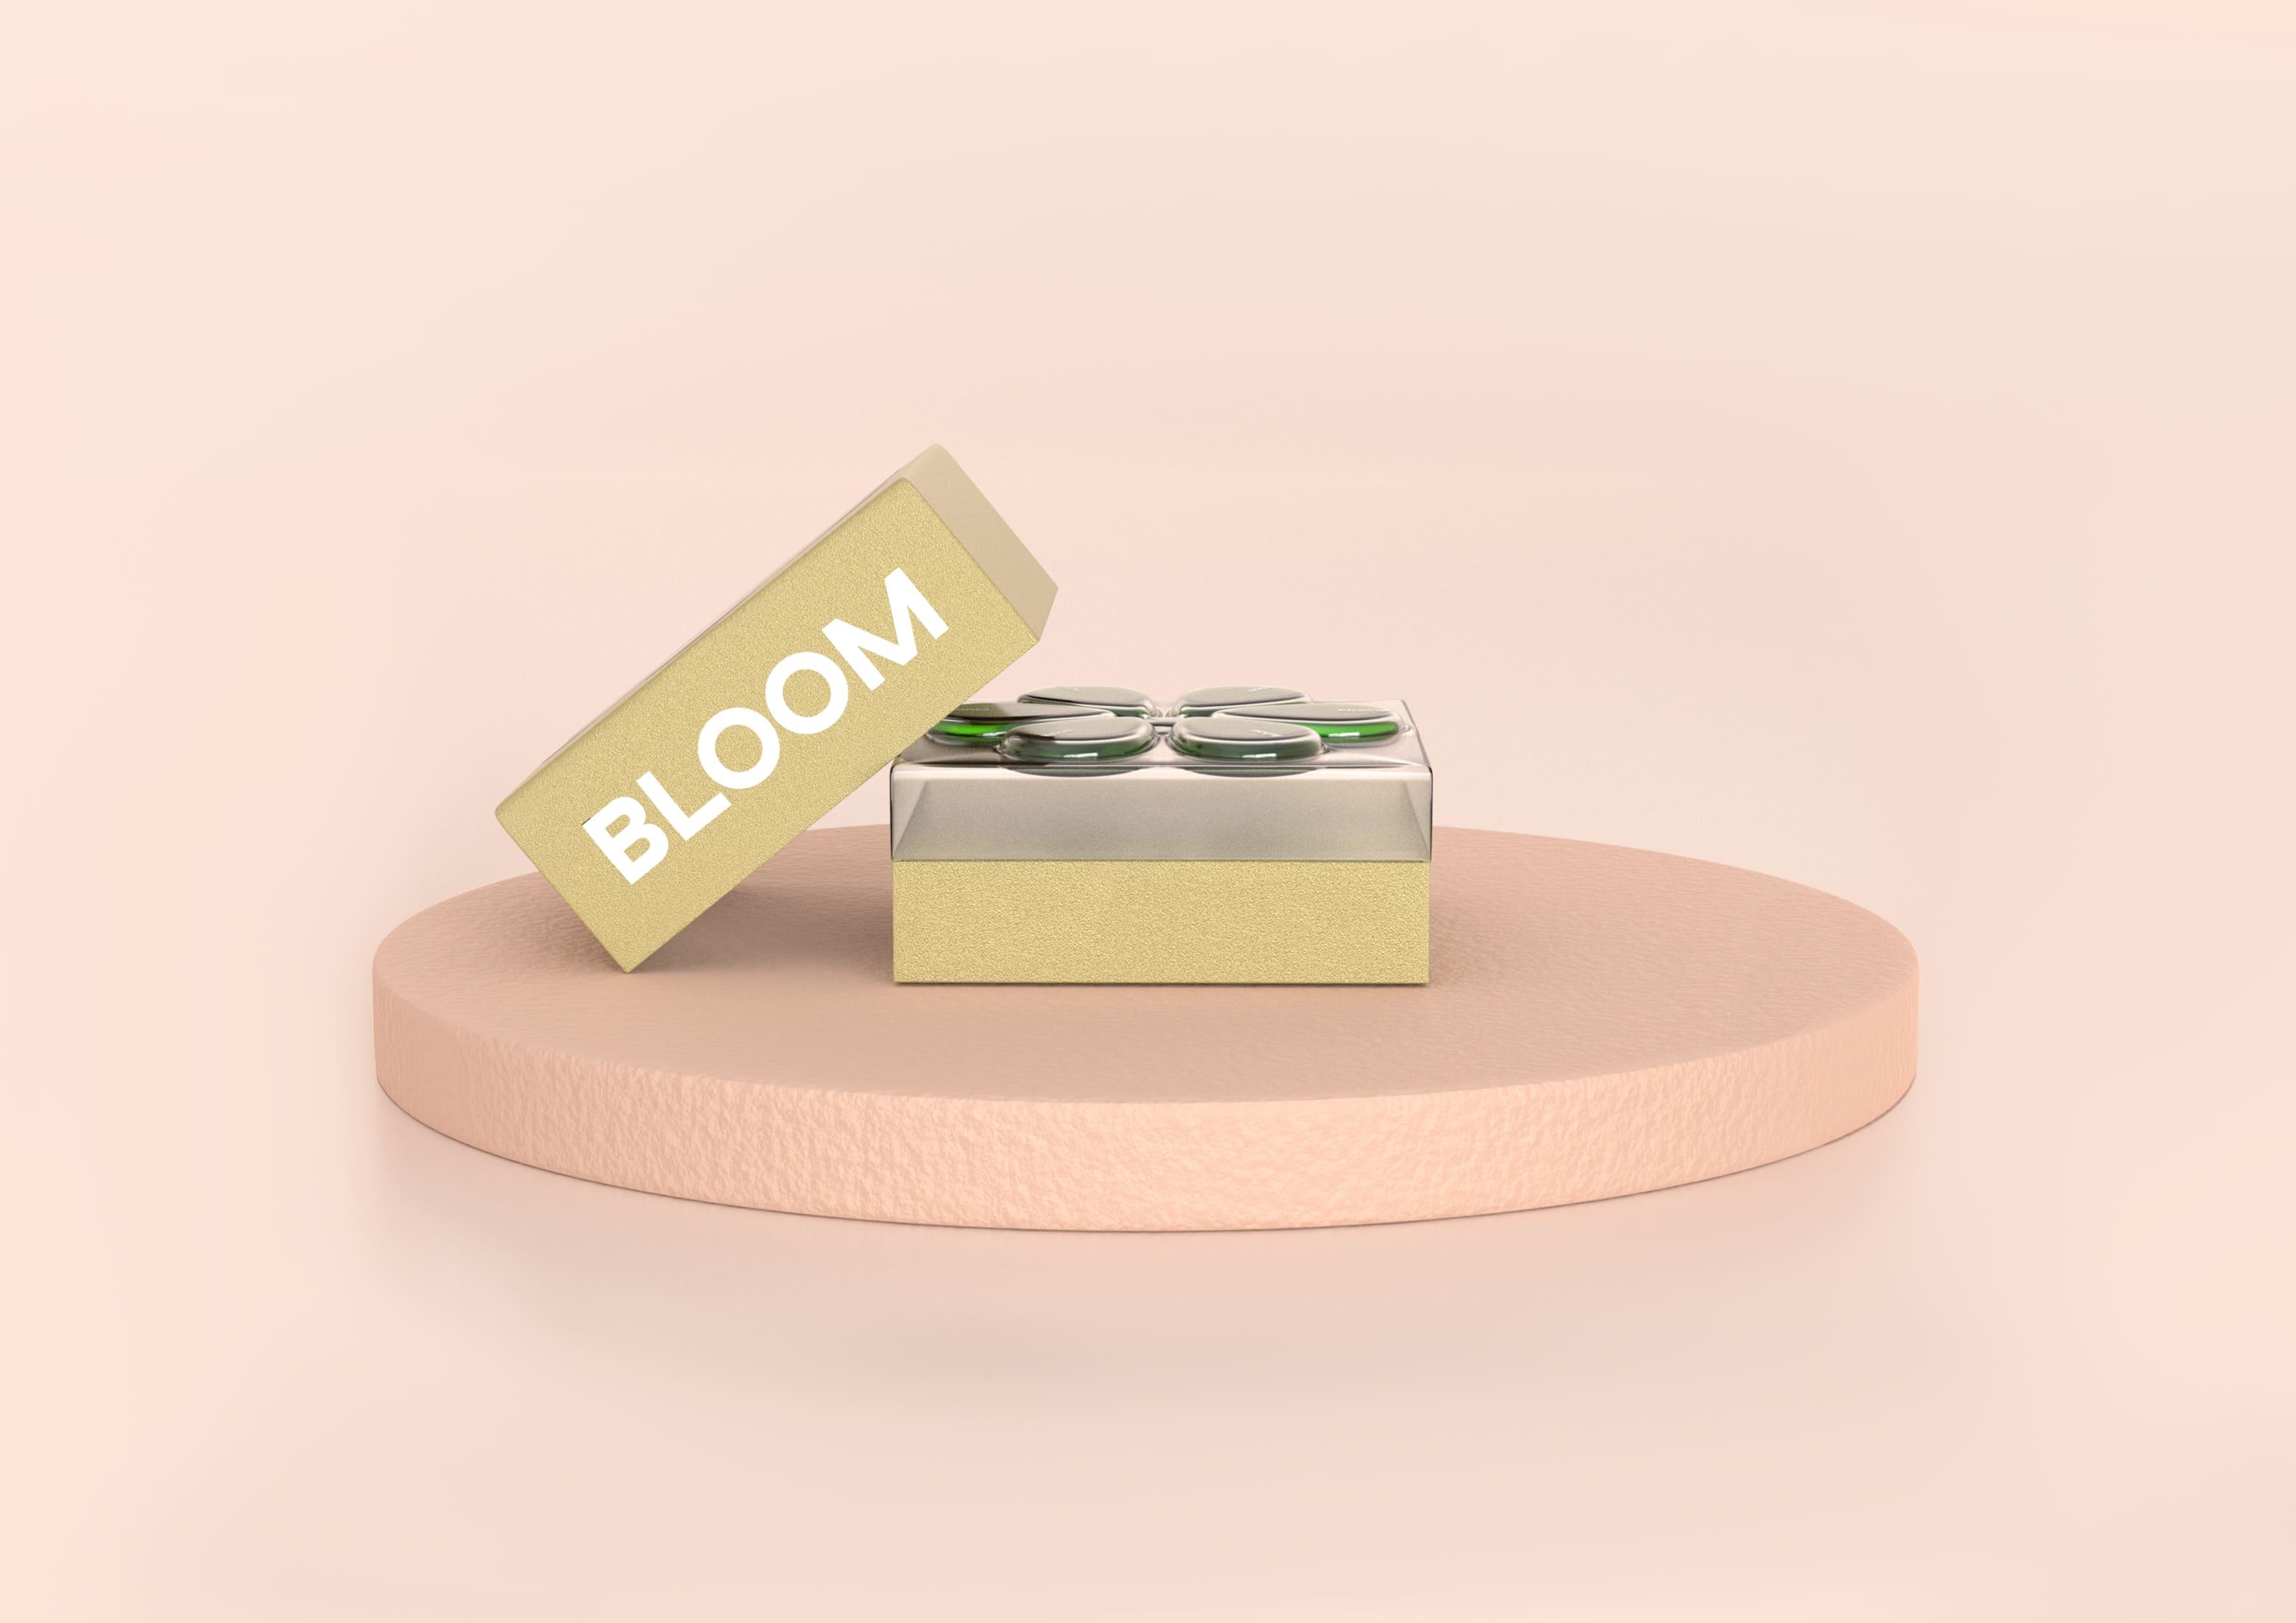 Student Product-Packaging Design Concept for Bloom Face Oil Moisturiser